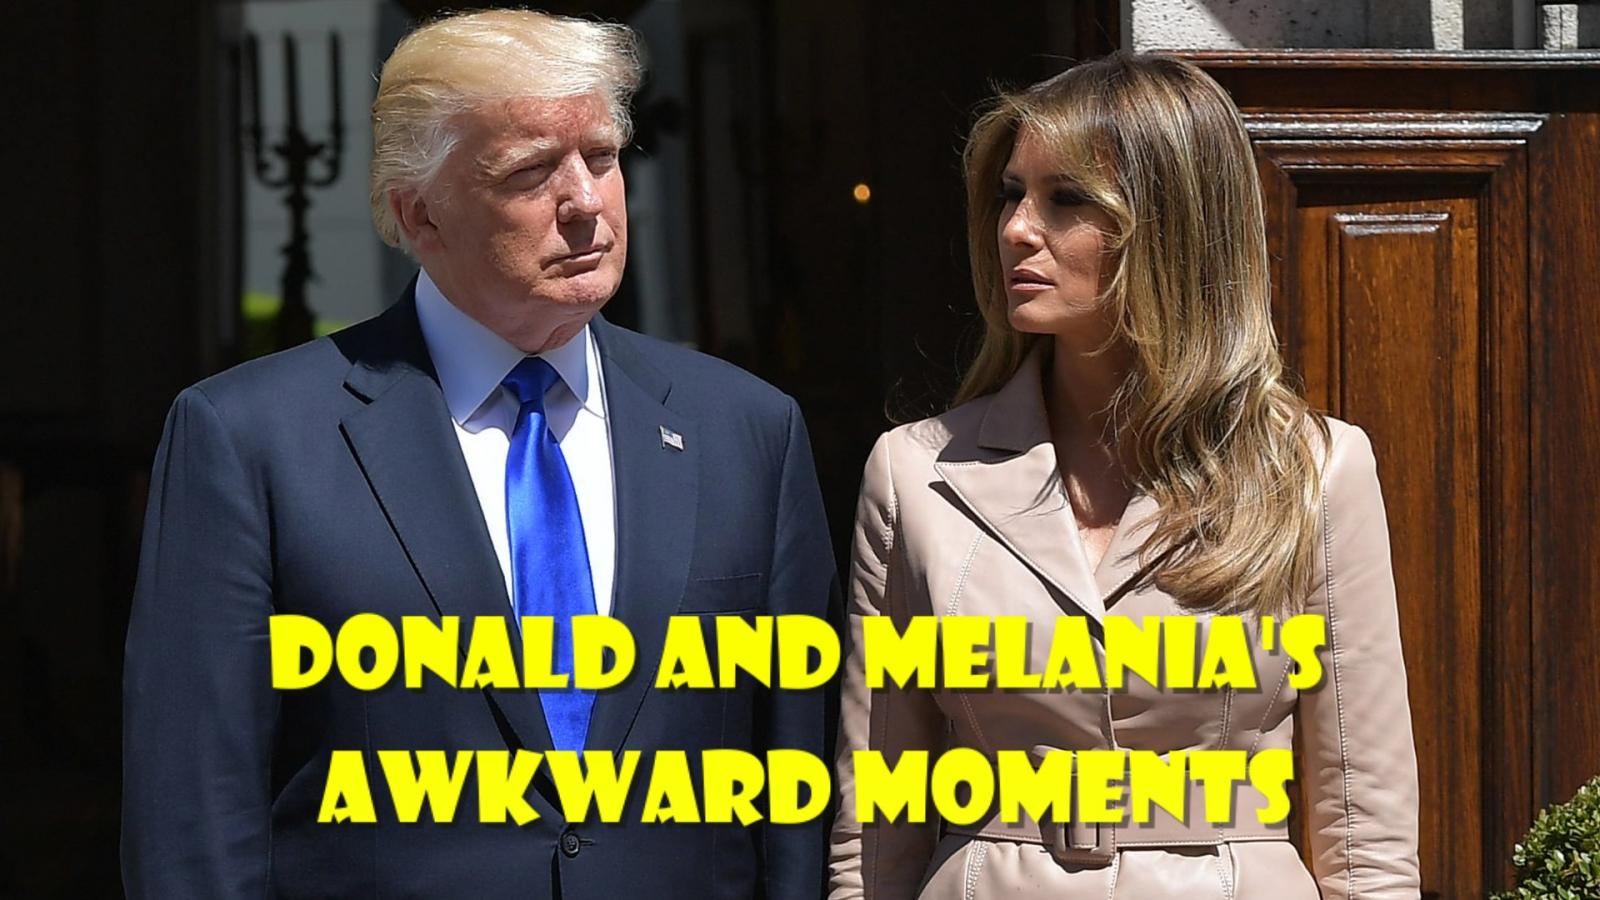 watch-donald-and-melanias-awkward-moments